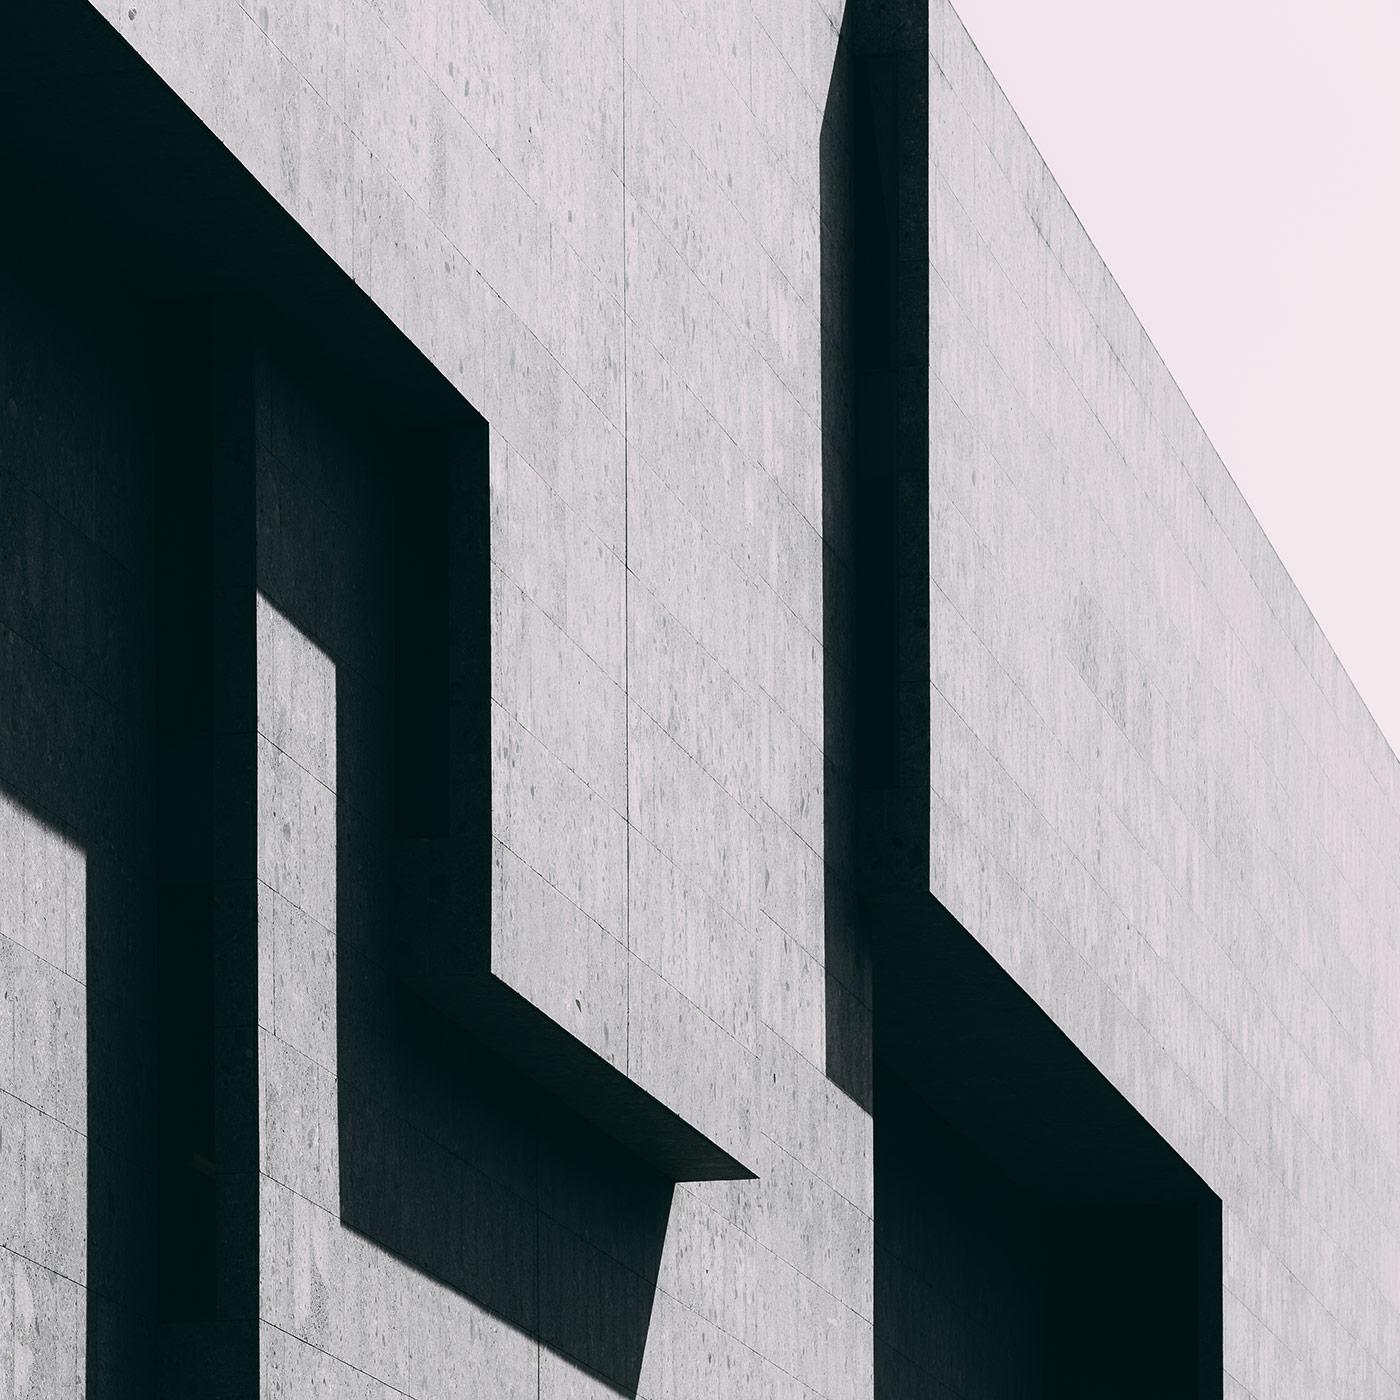 sebastian-weiss-monolicious-09